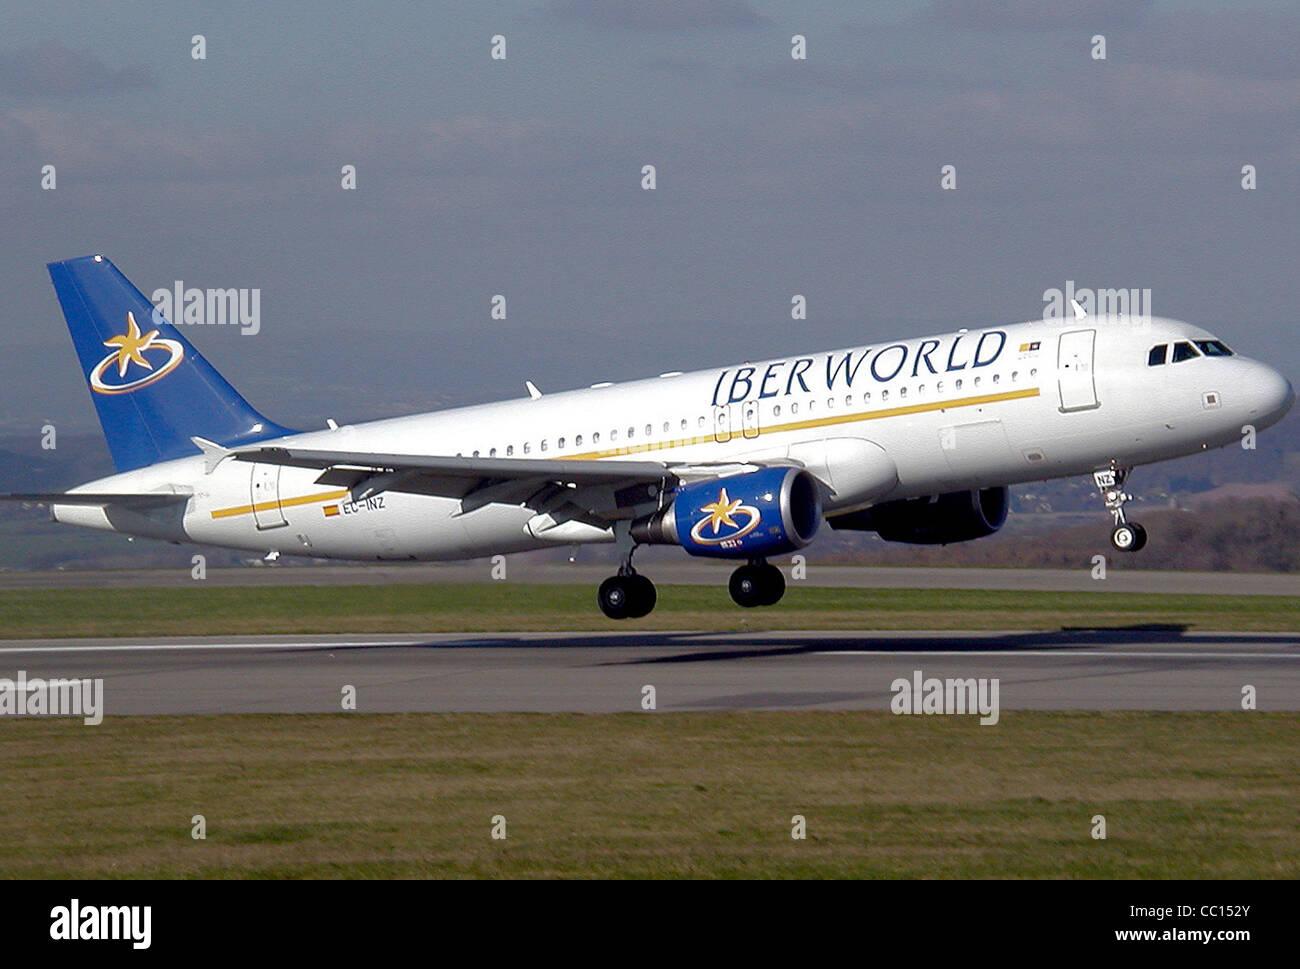 Iberworld Airbus A320-200 (EC-INZ) landing at Bristol Airport, England. - Stock Image